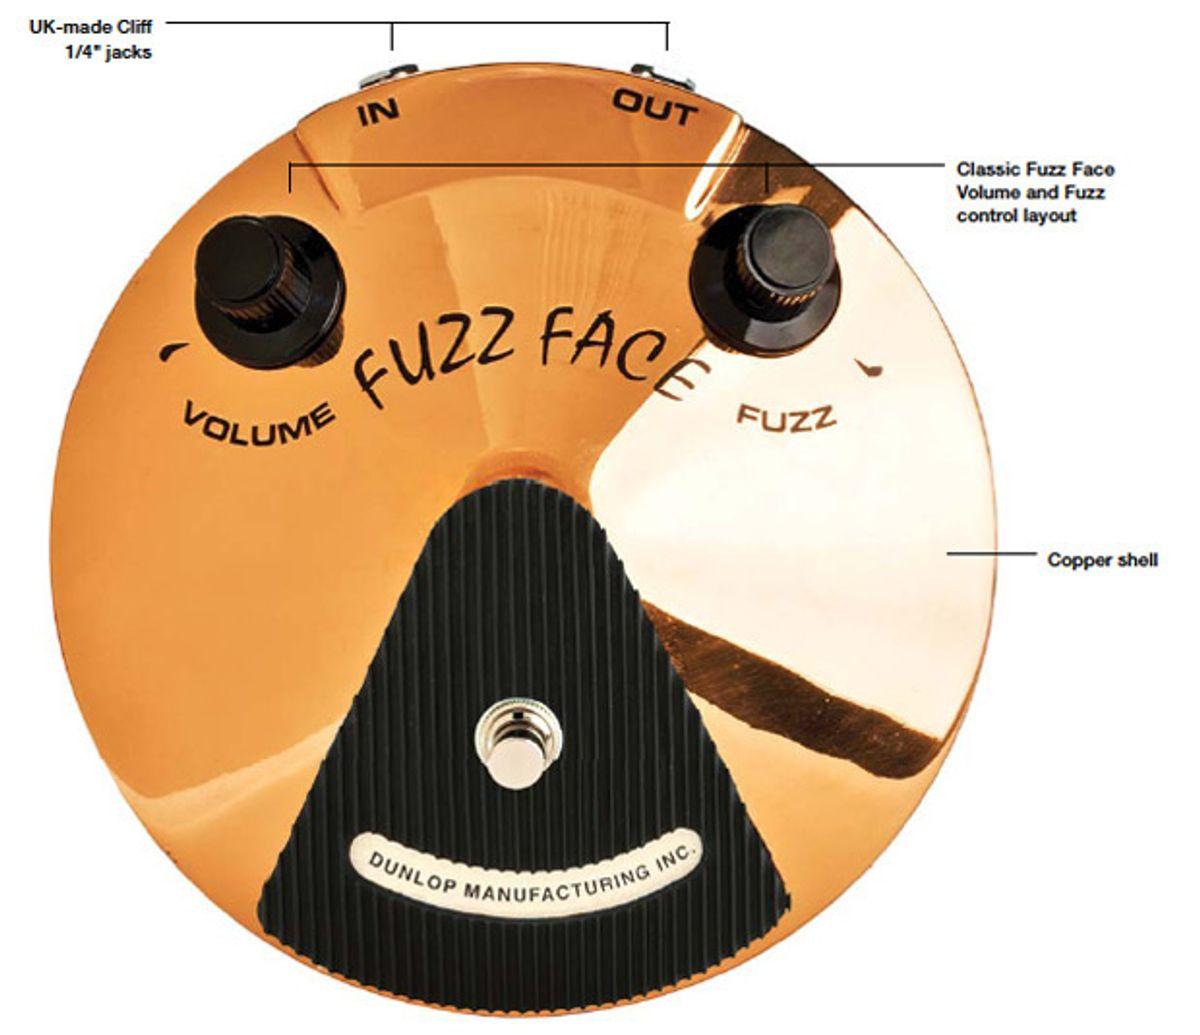 Dunlop JBF3 Joe Bonamassa Signature Fuzz Face Pedal Review